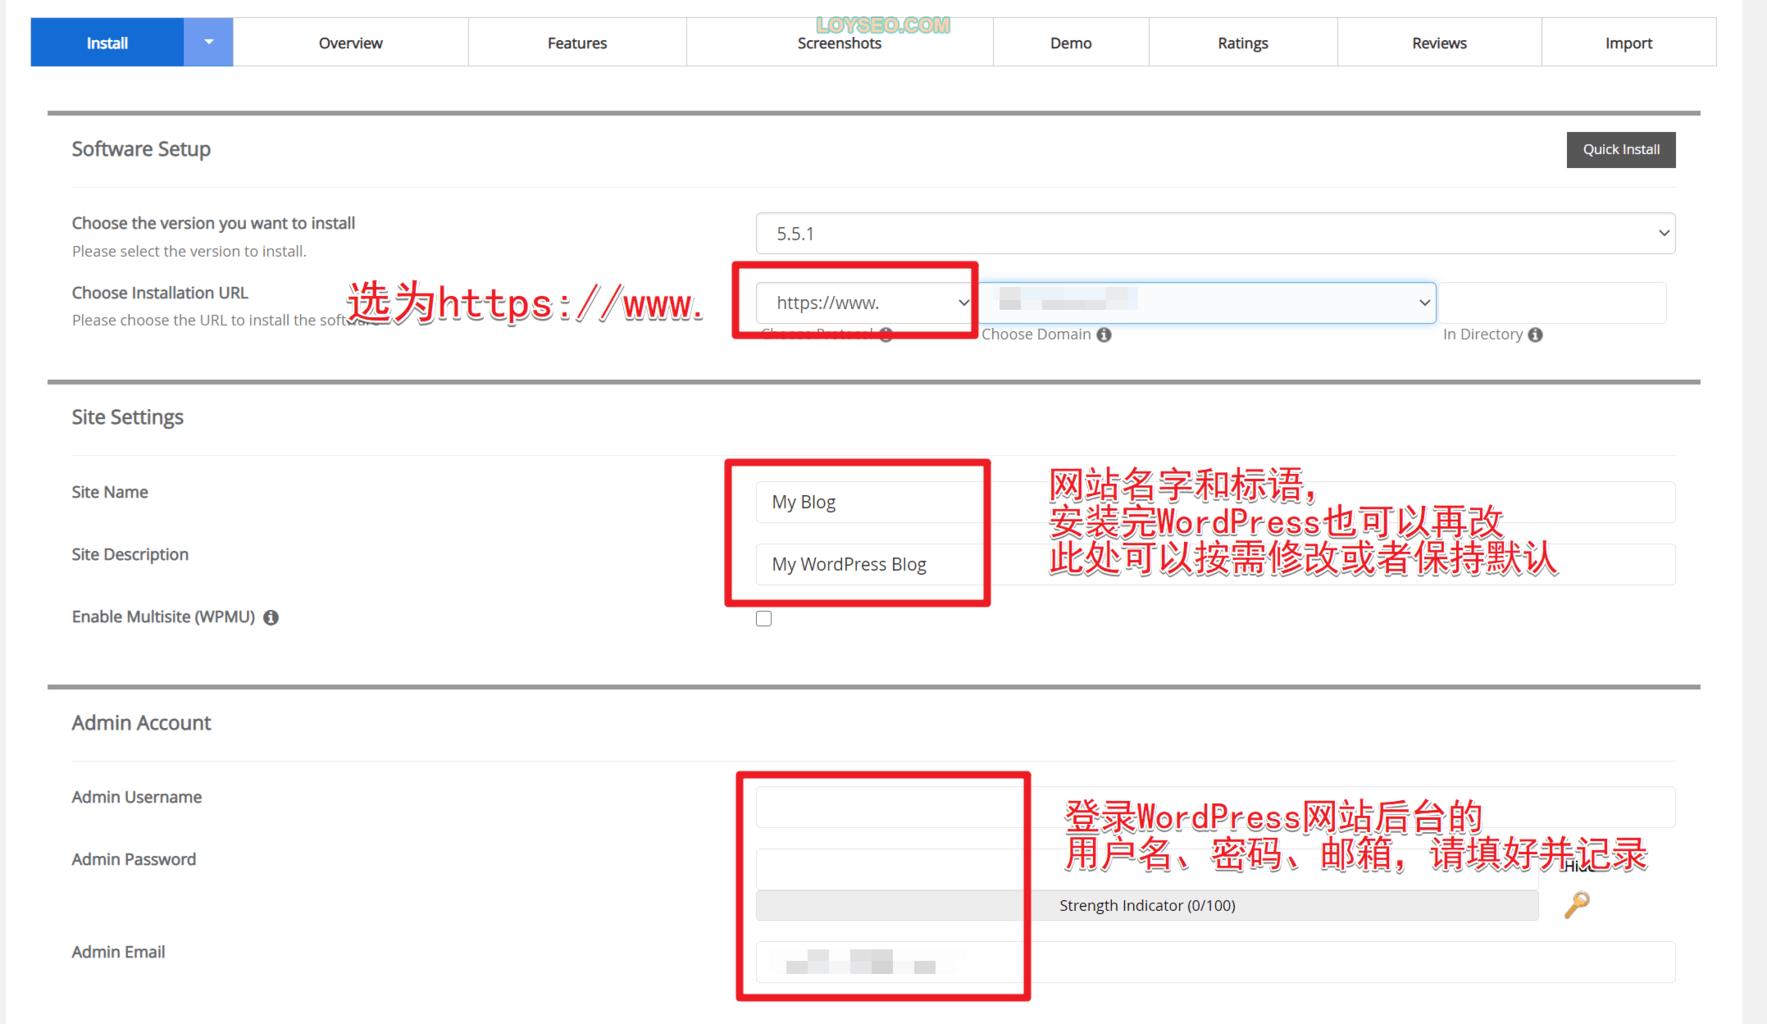 image 44 - ChemiCloud主机测评、选购要点、建外贸网站教程